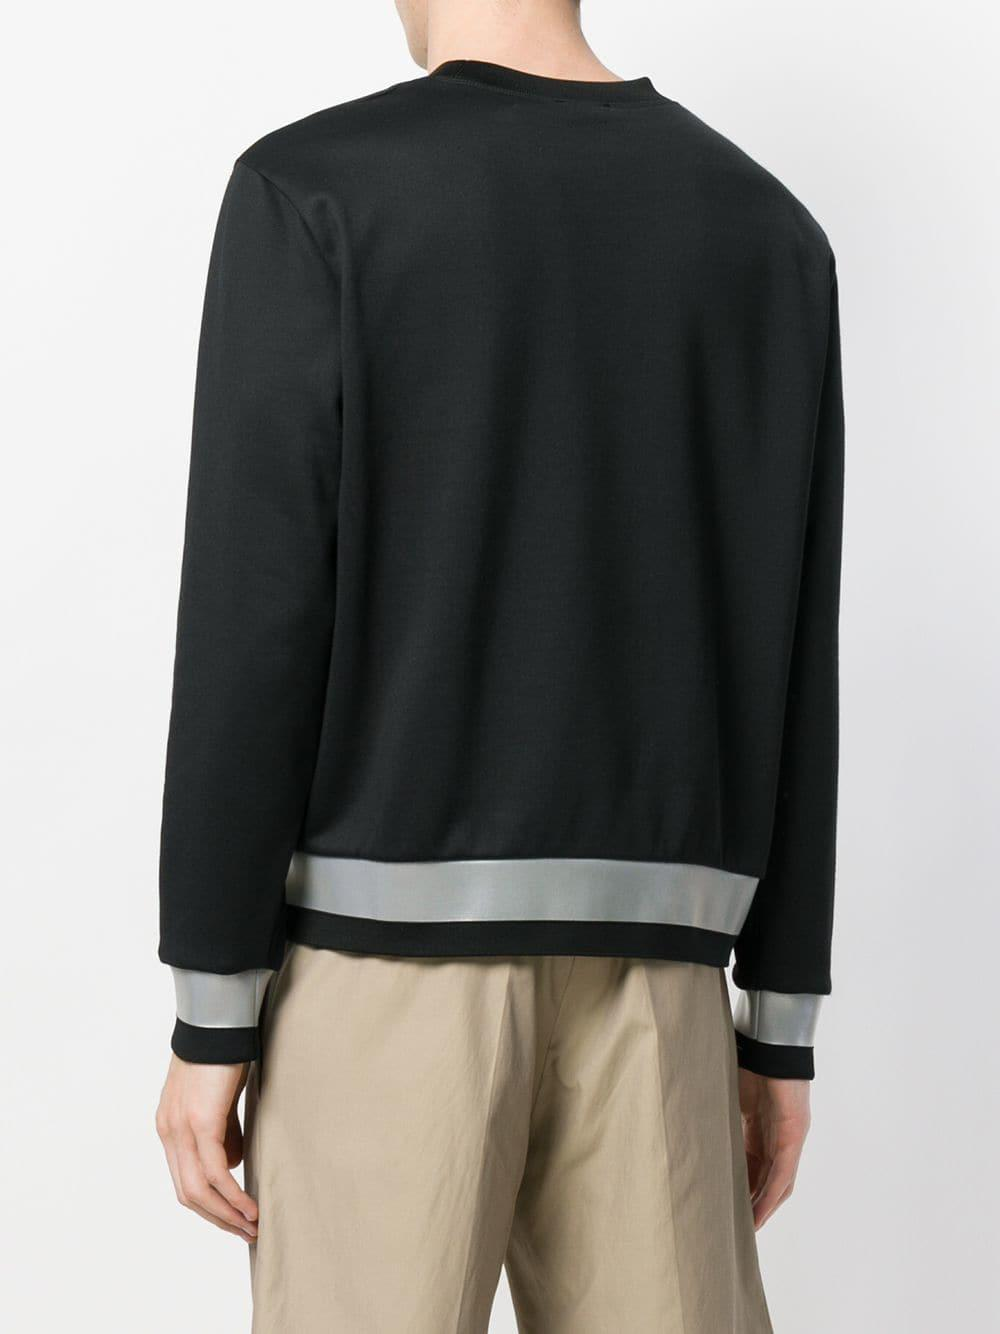 moncler craig green sweatshirt